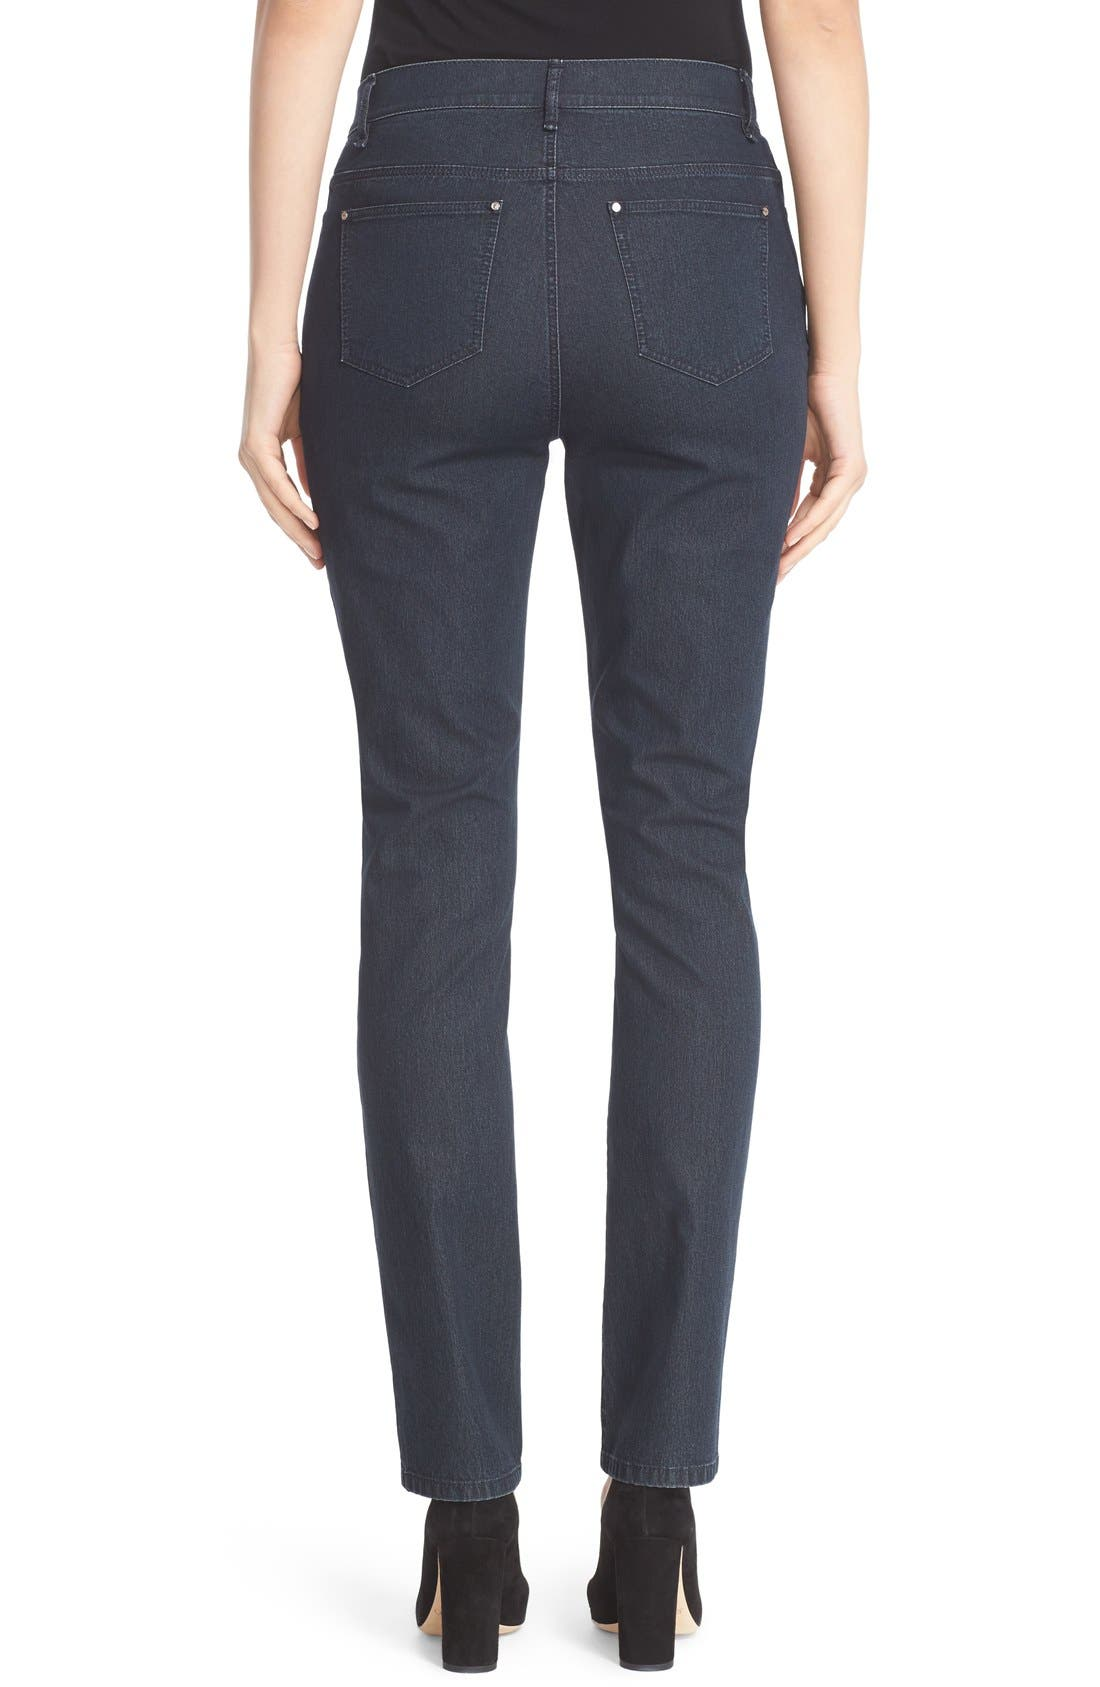 Alternate Image 2  - Lafayette 148 New York 'Primo Denim' Curvy Fit Slim Leg Jeans